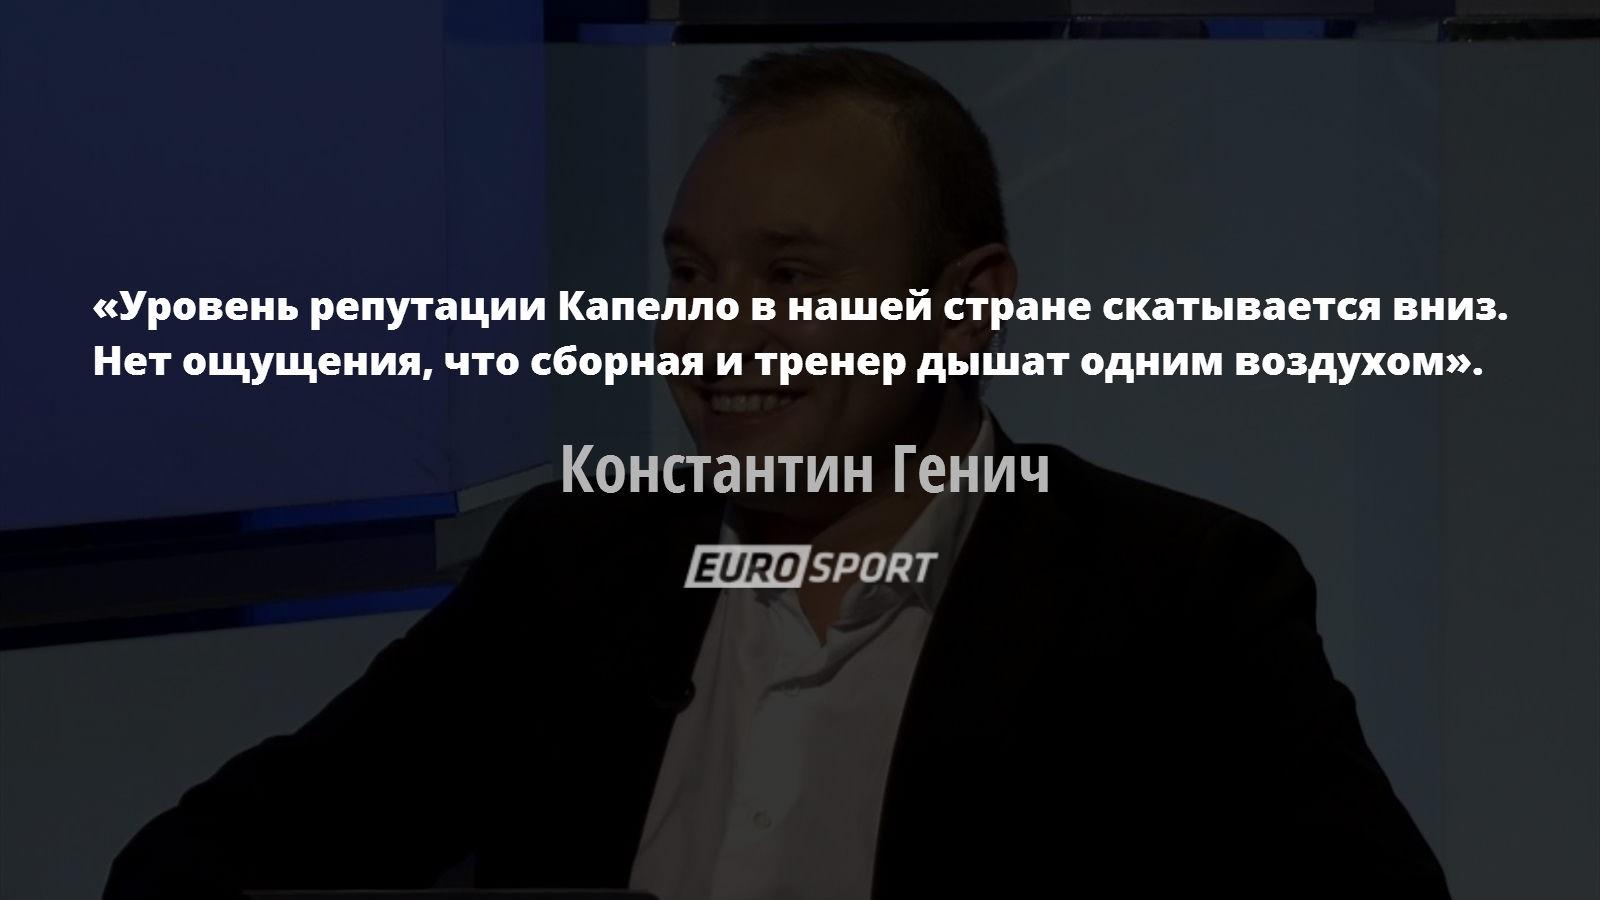 https://i.eurosport.com/2015/07/13/1639254.jpg